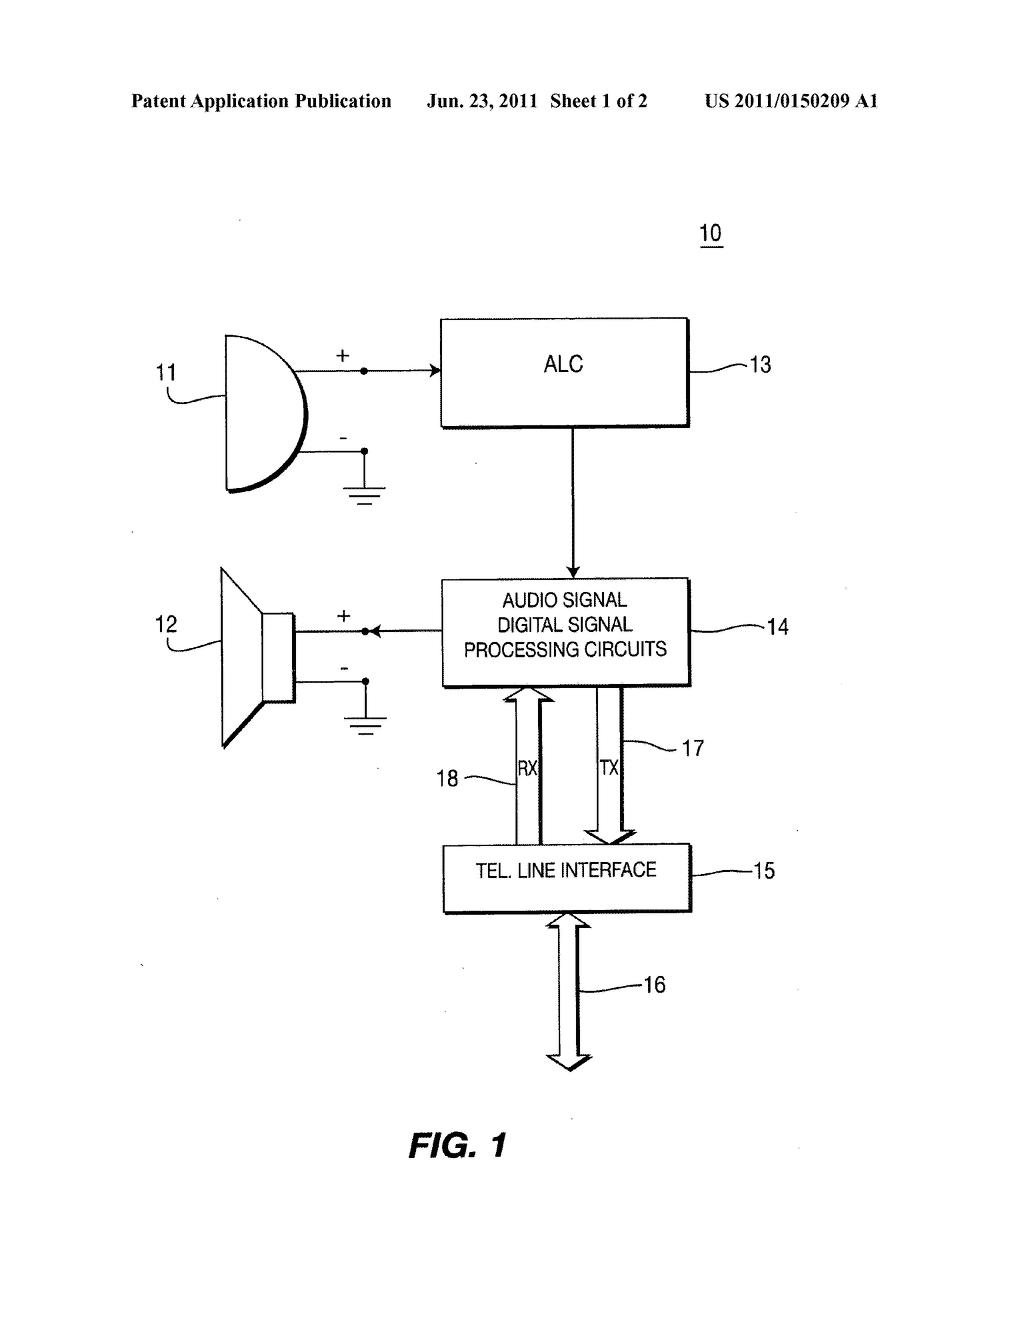 Digital Signal Control Diagram Trusted Wiring Diagrams Crystal Oscillator Signalprocessing Circuit Seekiccom Full Duplex Telephone System Employing Automatic Level For Audio Processor